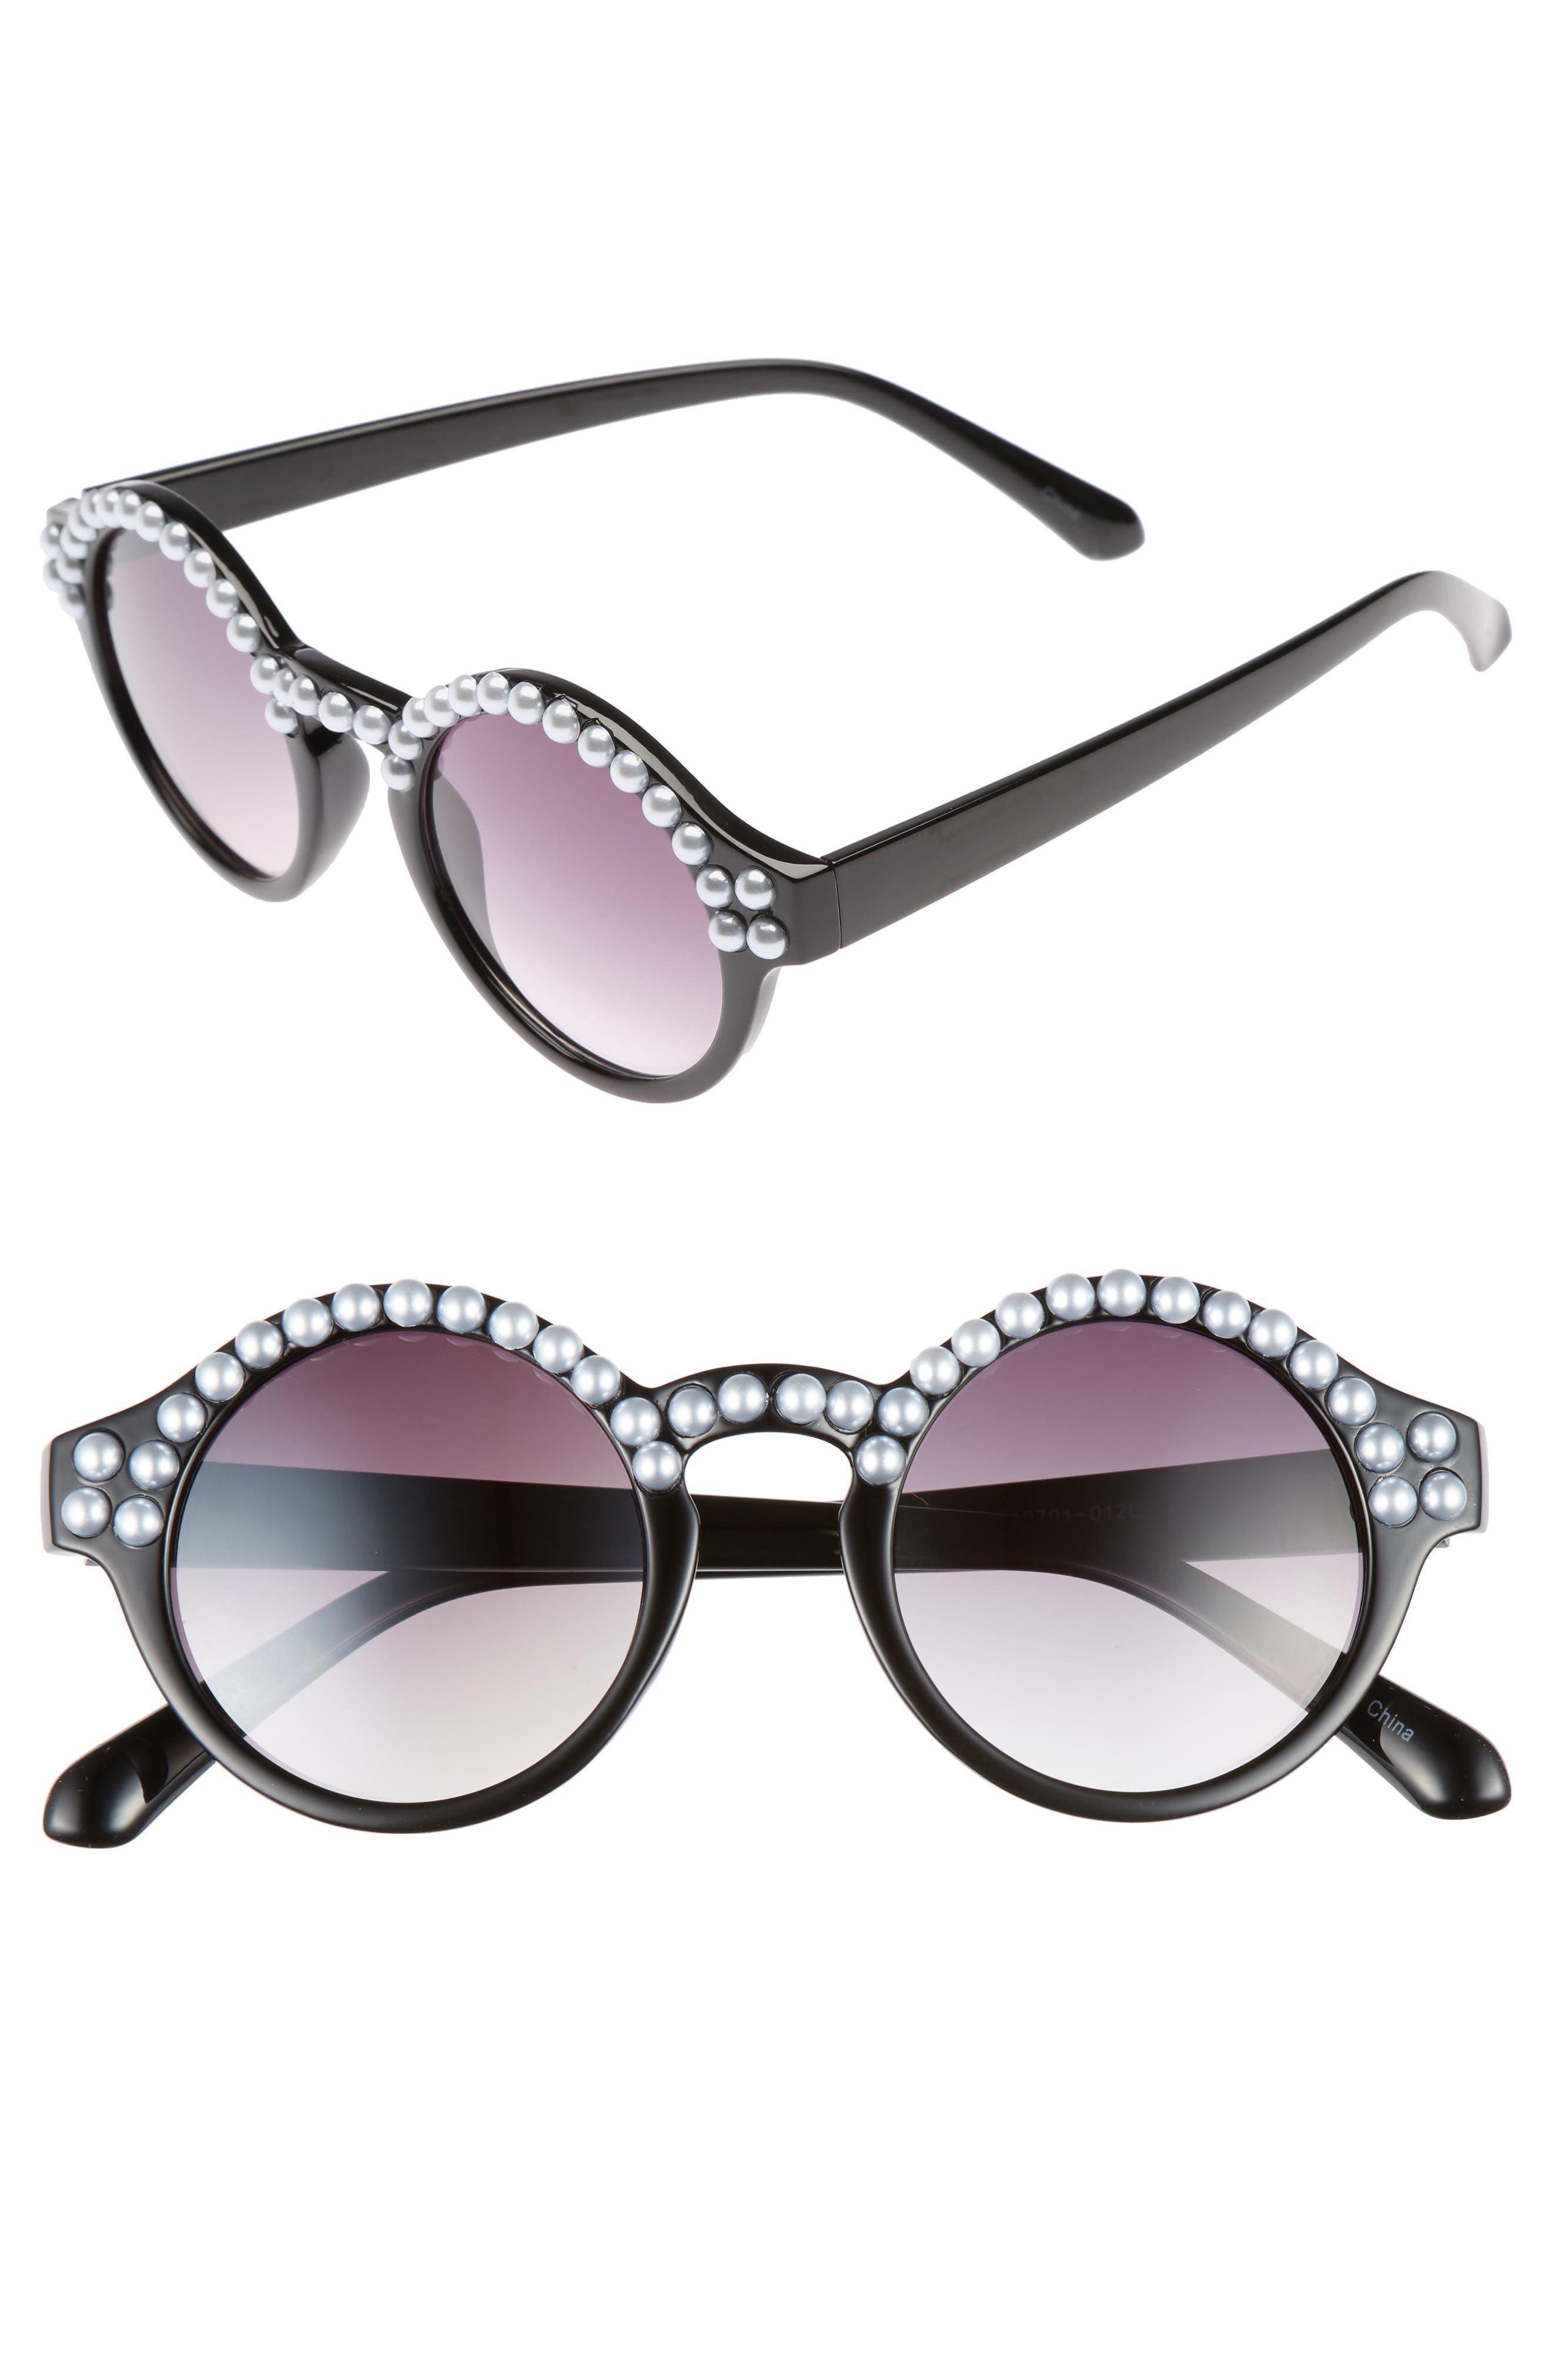 45mm Imitation Pearl Round Sunglasses,                             Main thumbnail 1, color,                             002